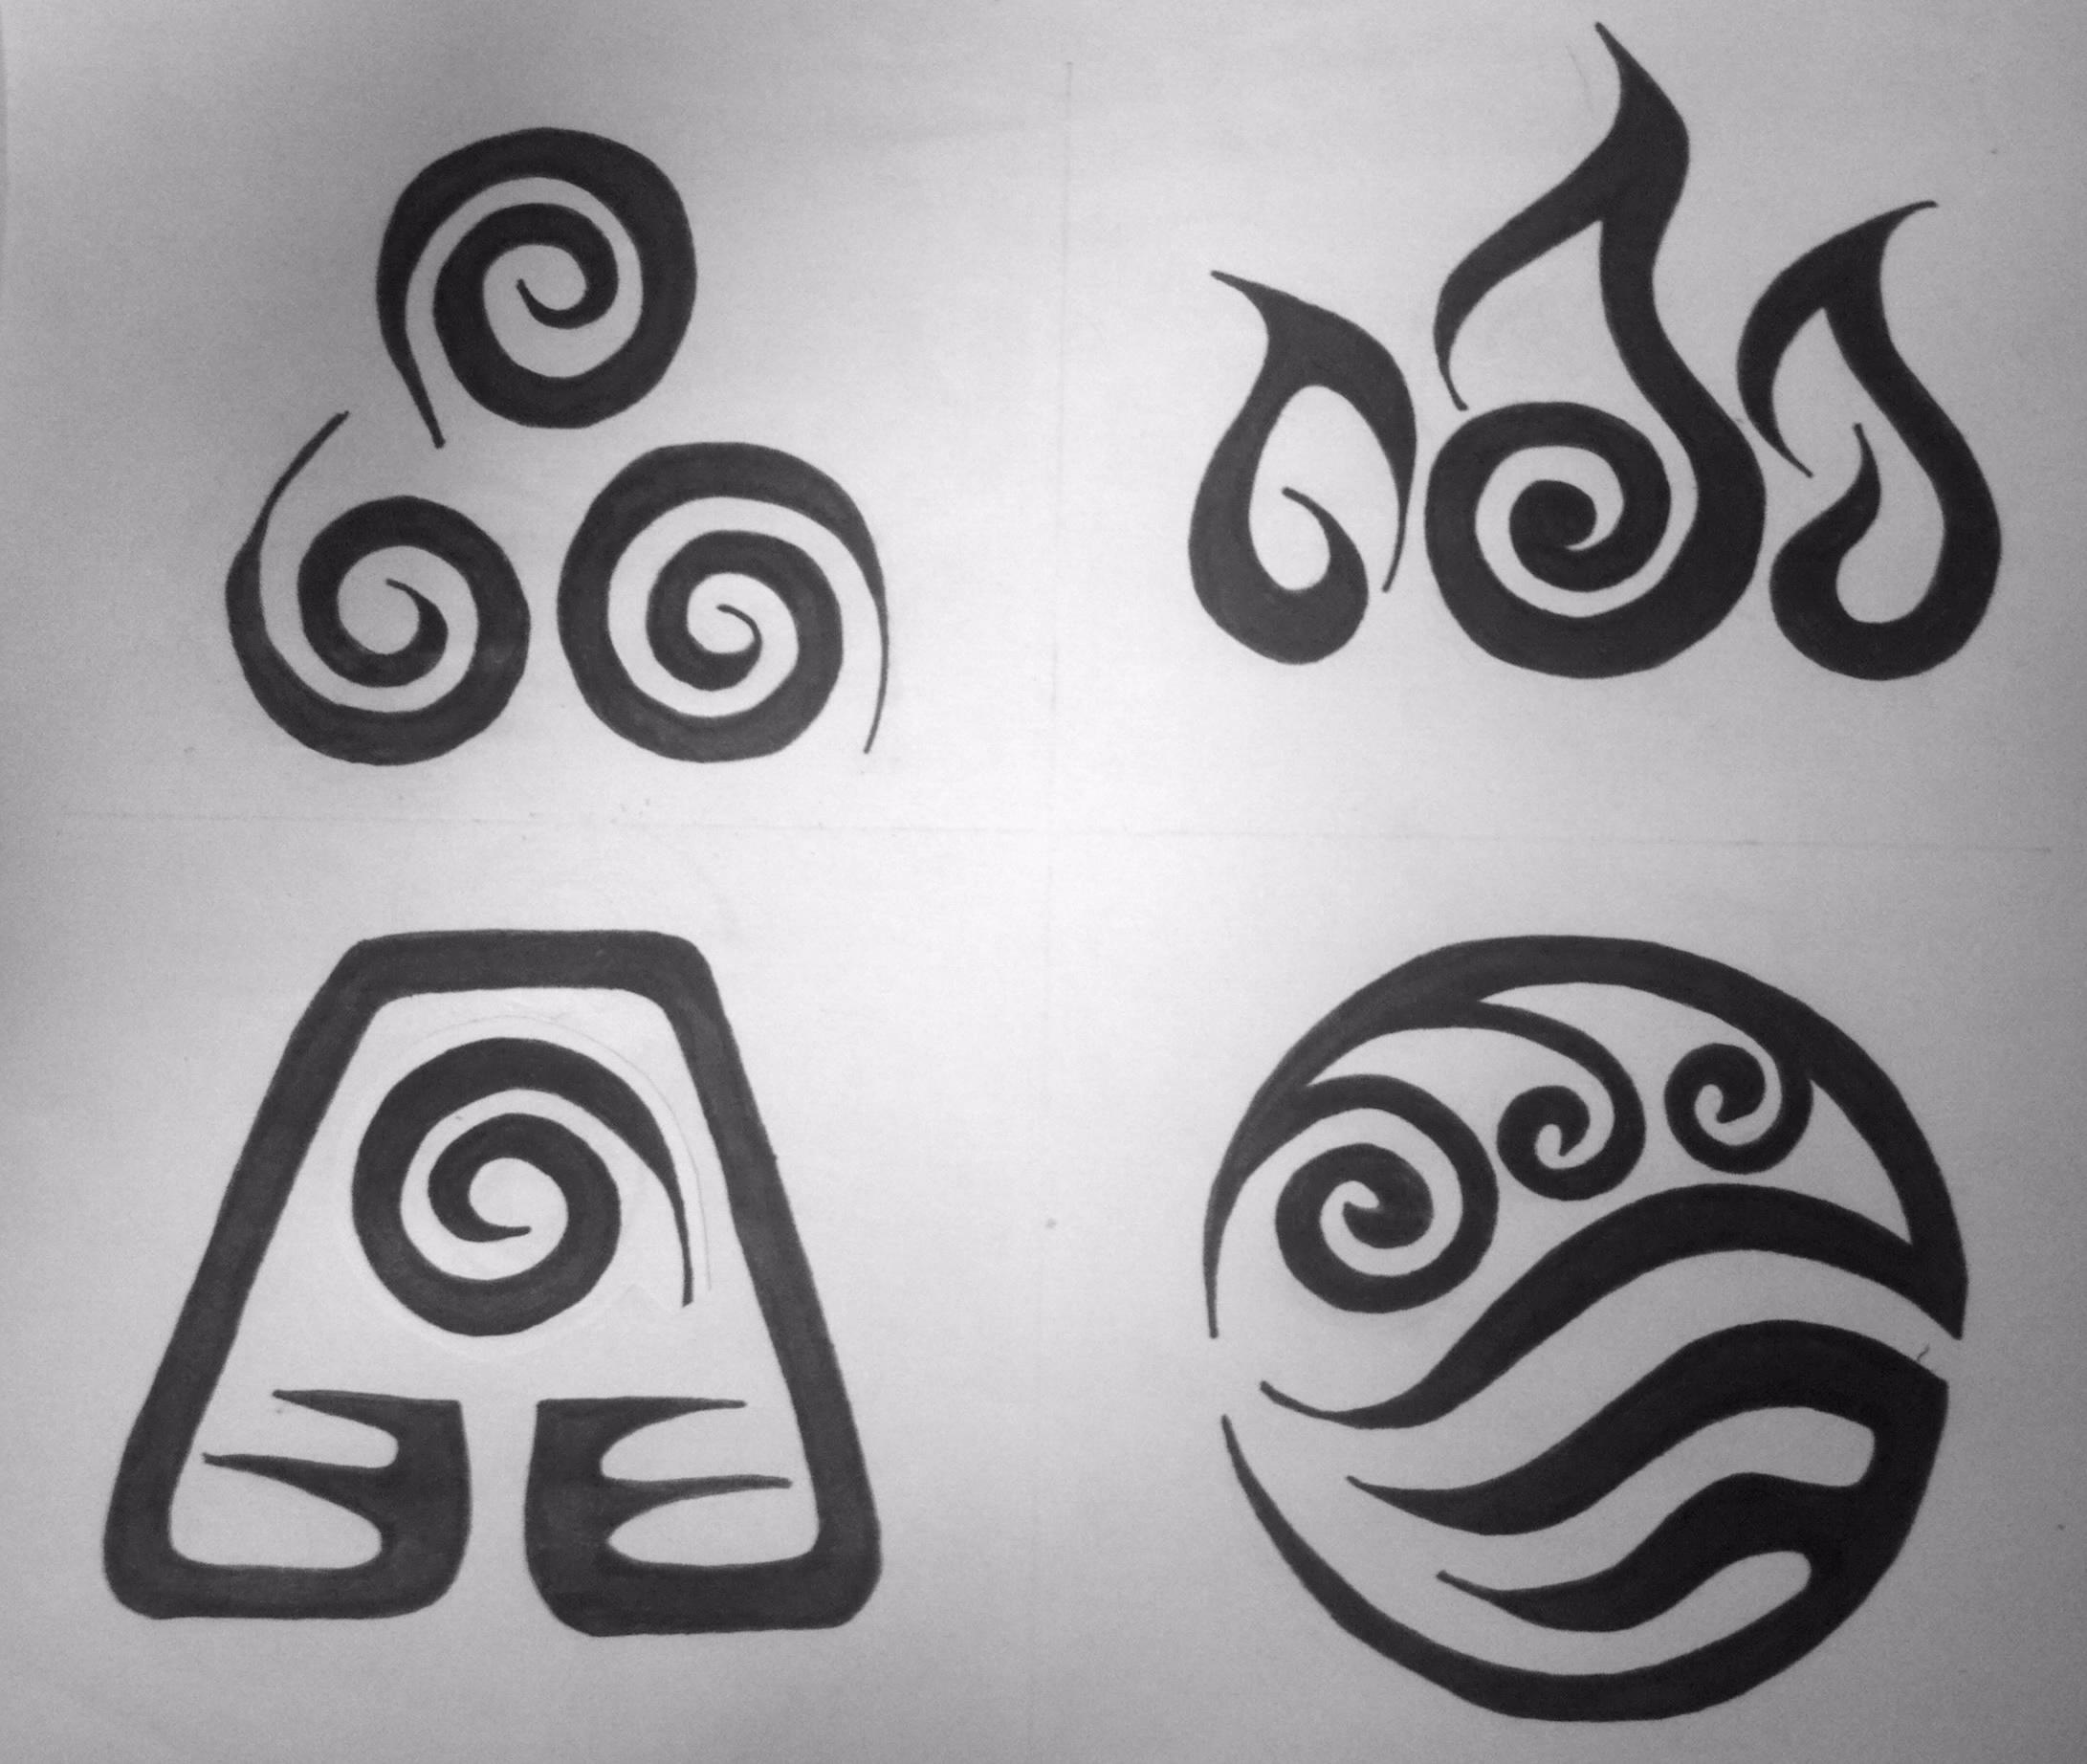 avatar element symbols tribal tattoo design by graffitica on deviantart. Black Bedroom Furniture Sets. Home Design Ideas